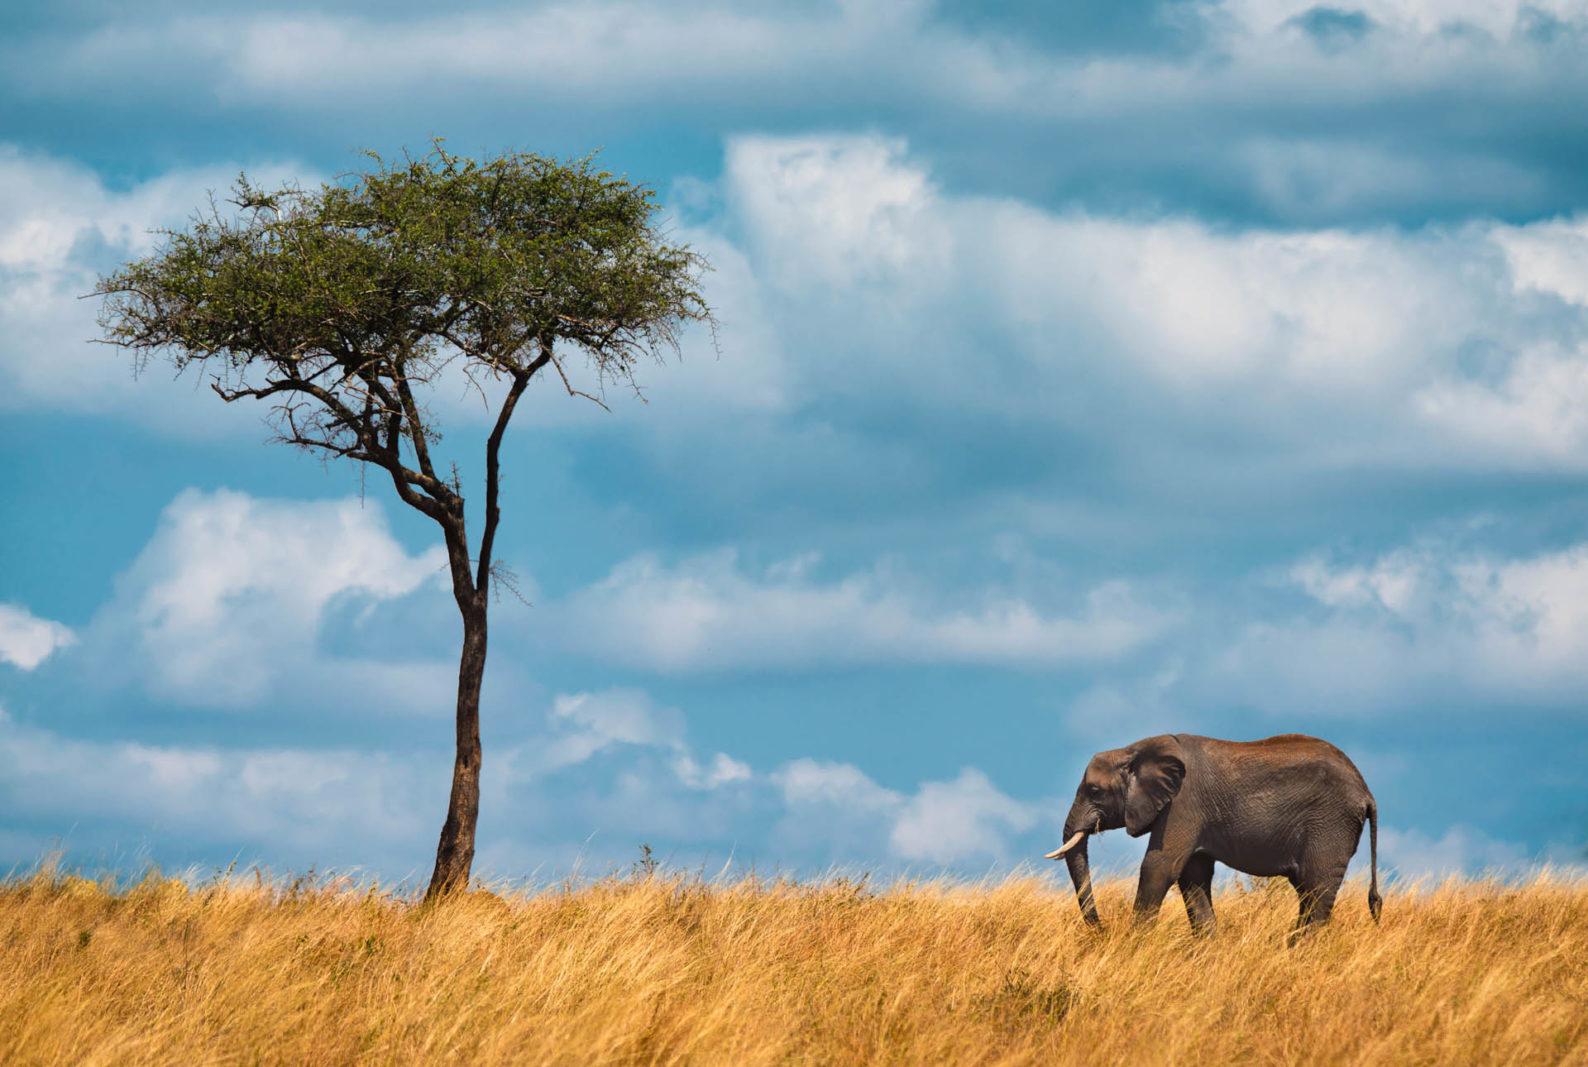 tanzania travel guide elephant and lone tree